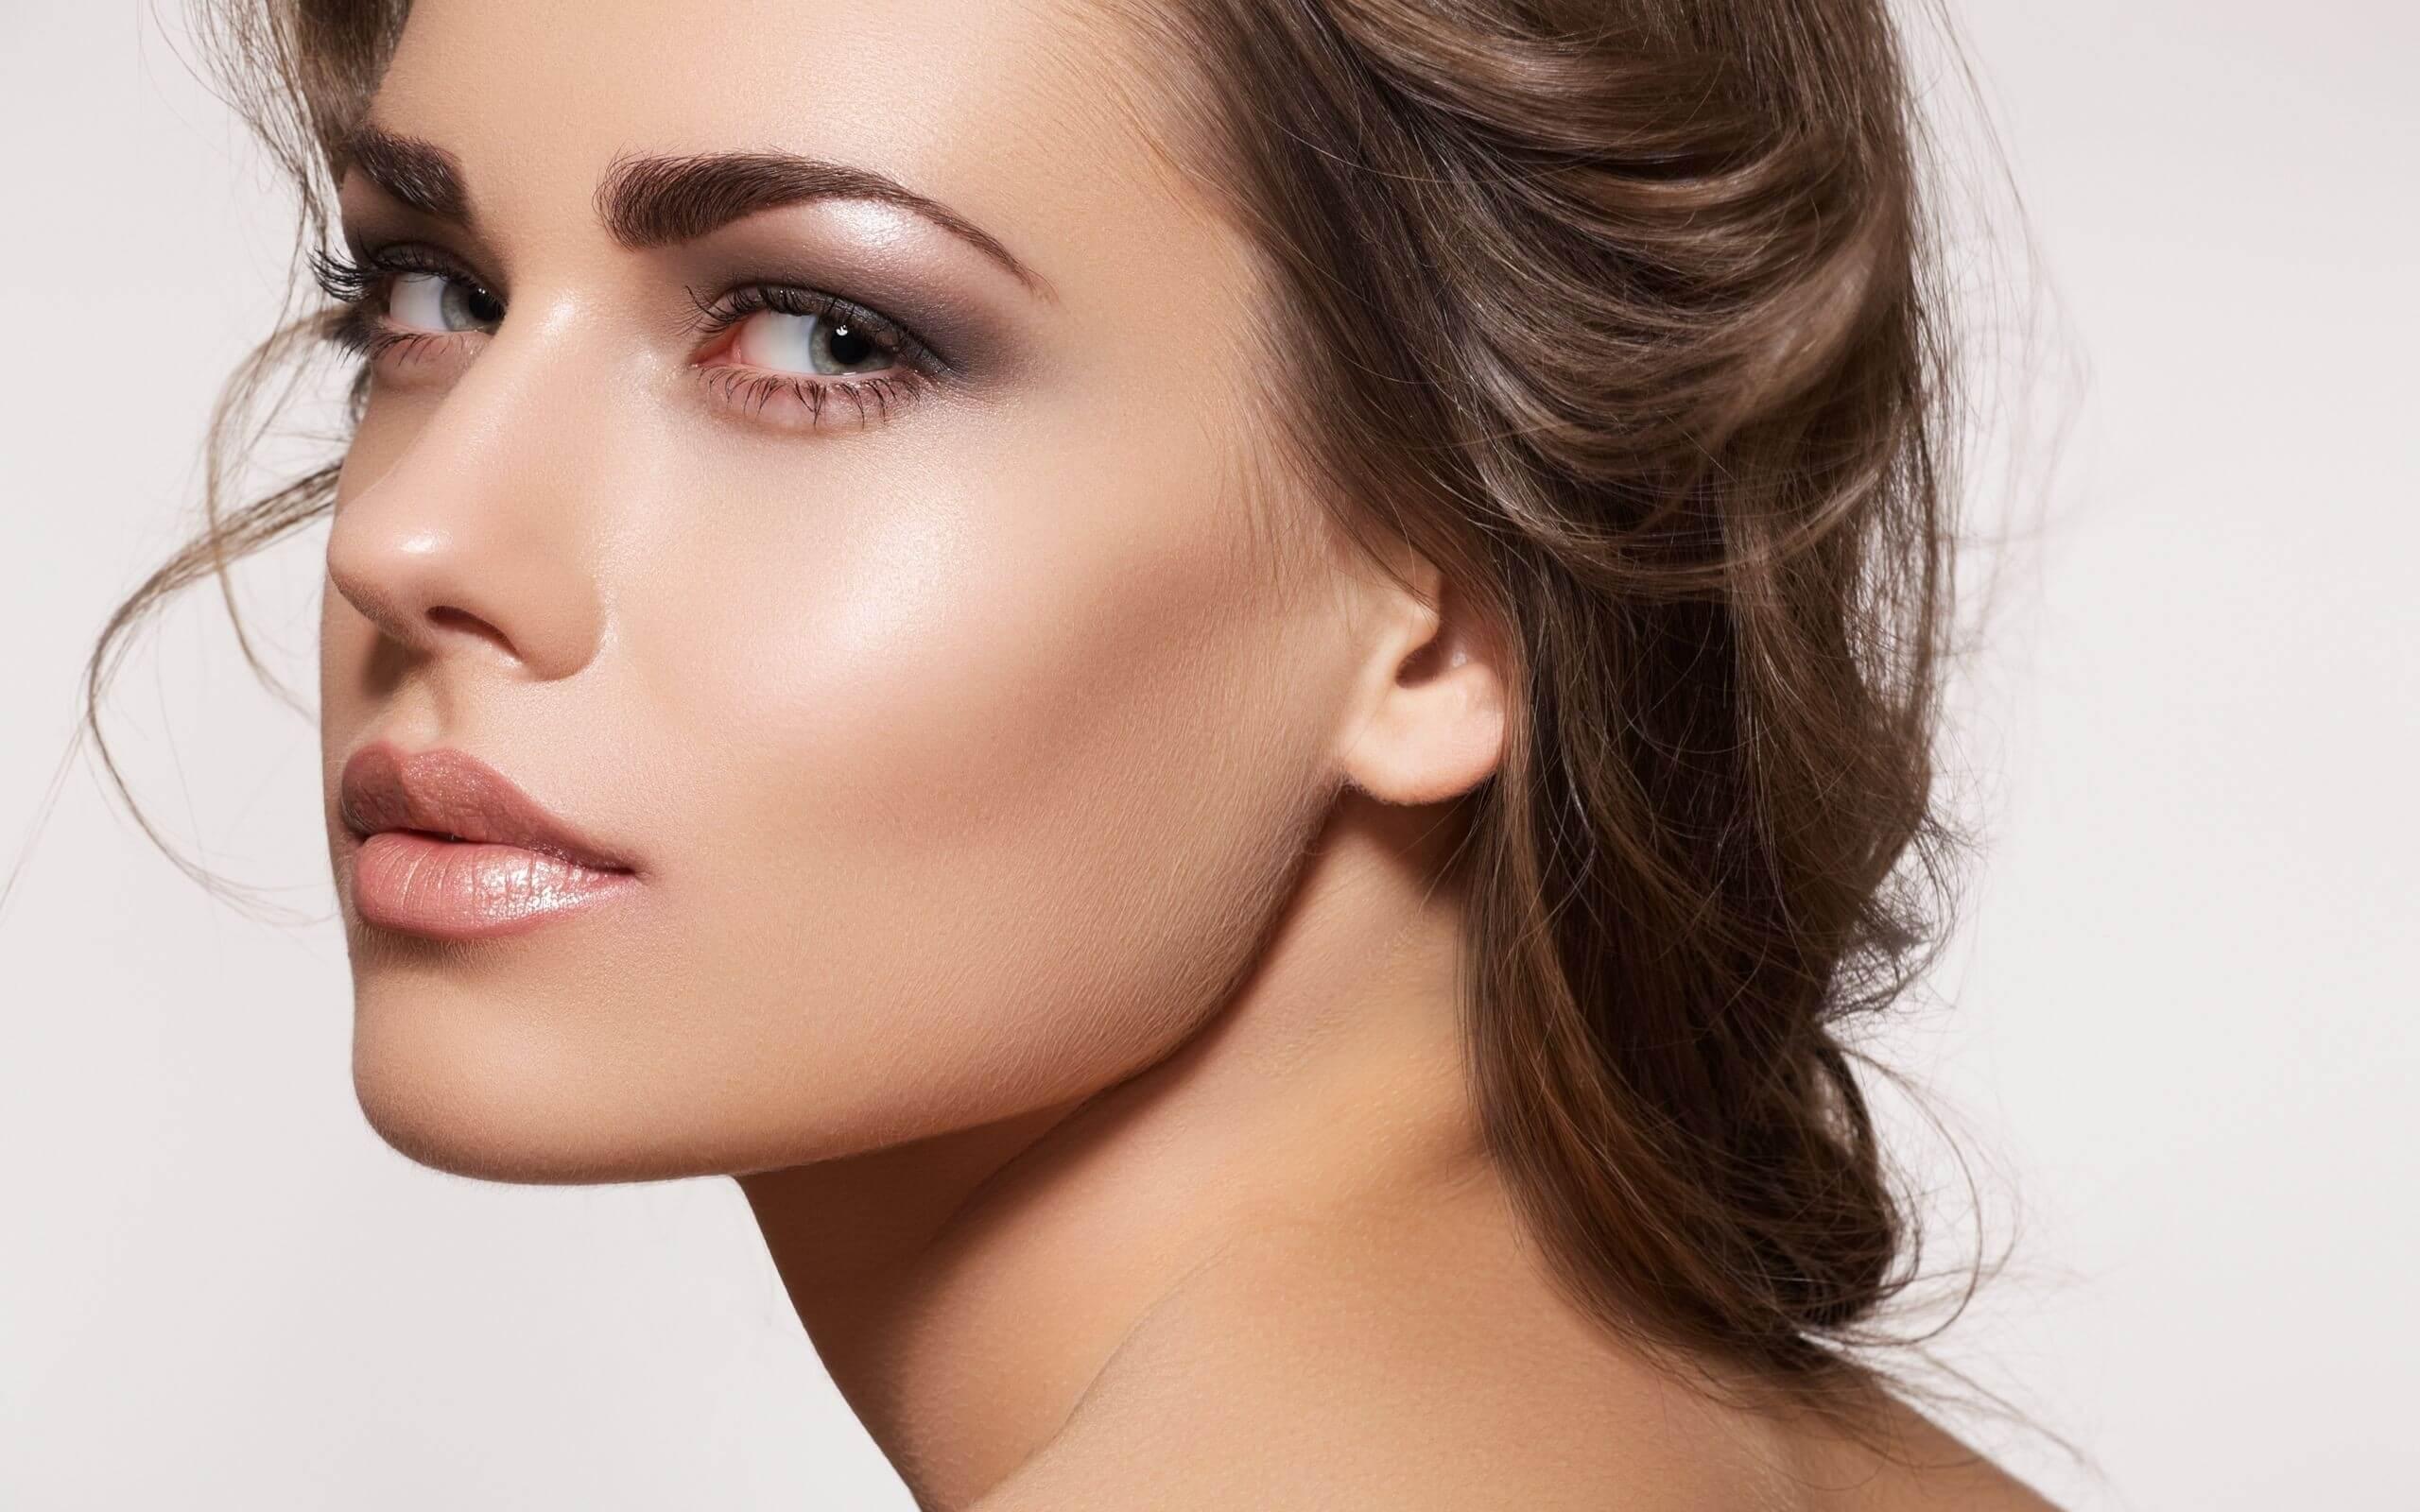 Tα πιο θηλυκά σημεία στο γυναικείο σώμα έχουν τα δικά τους μυστικά…